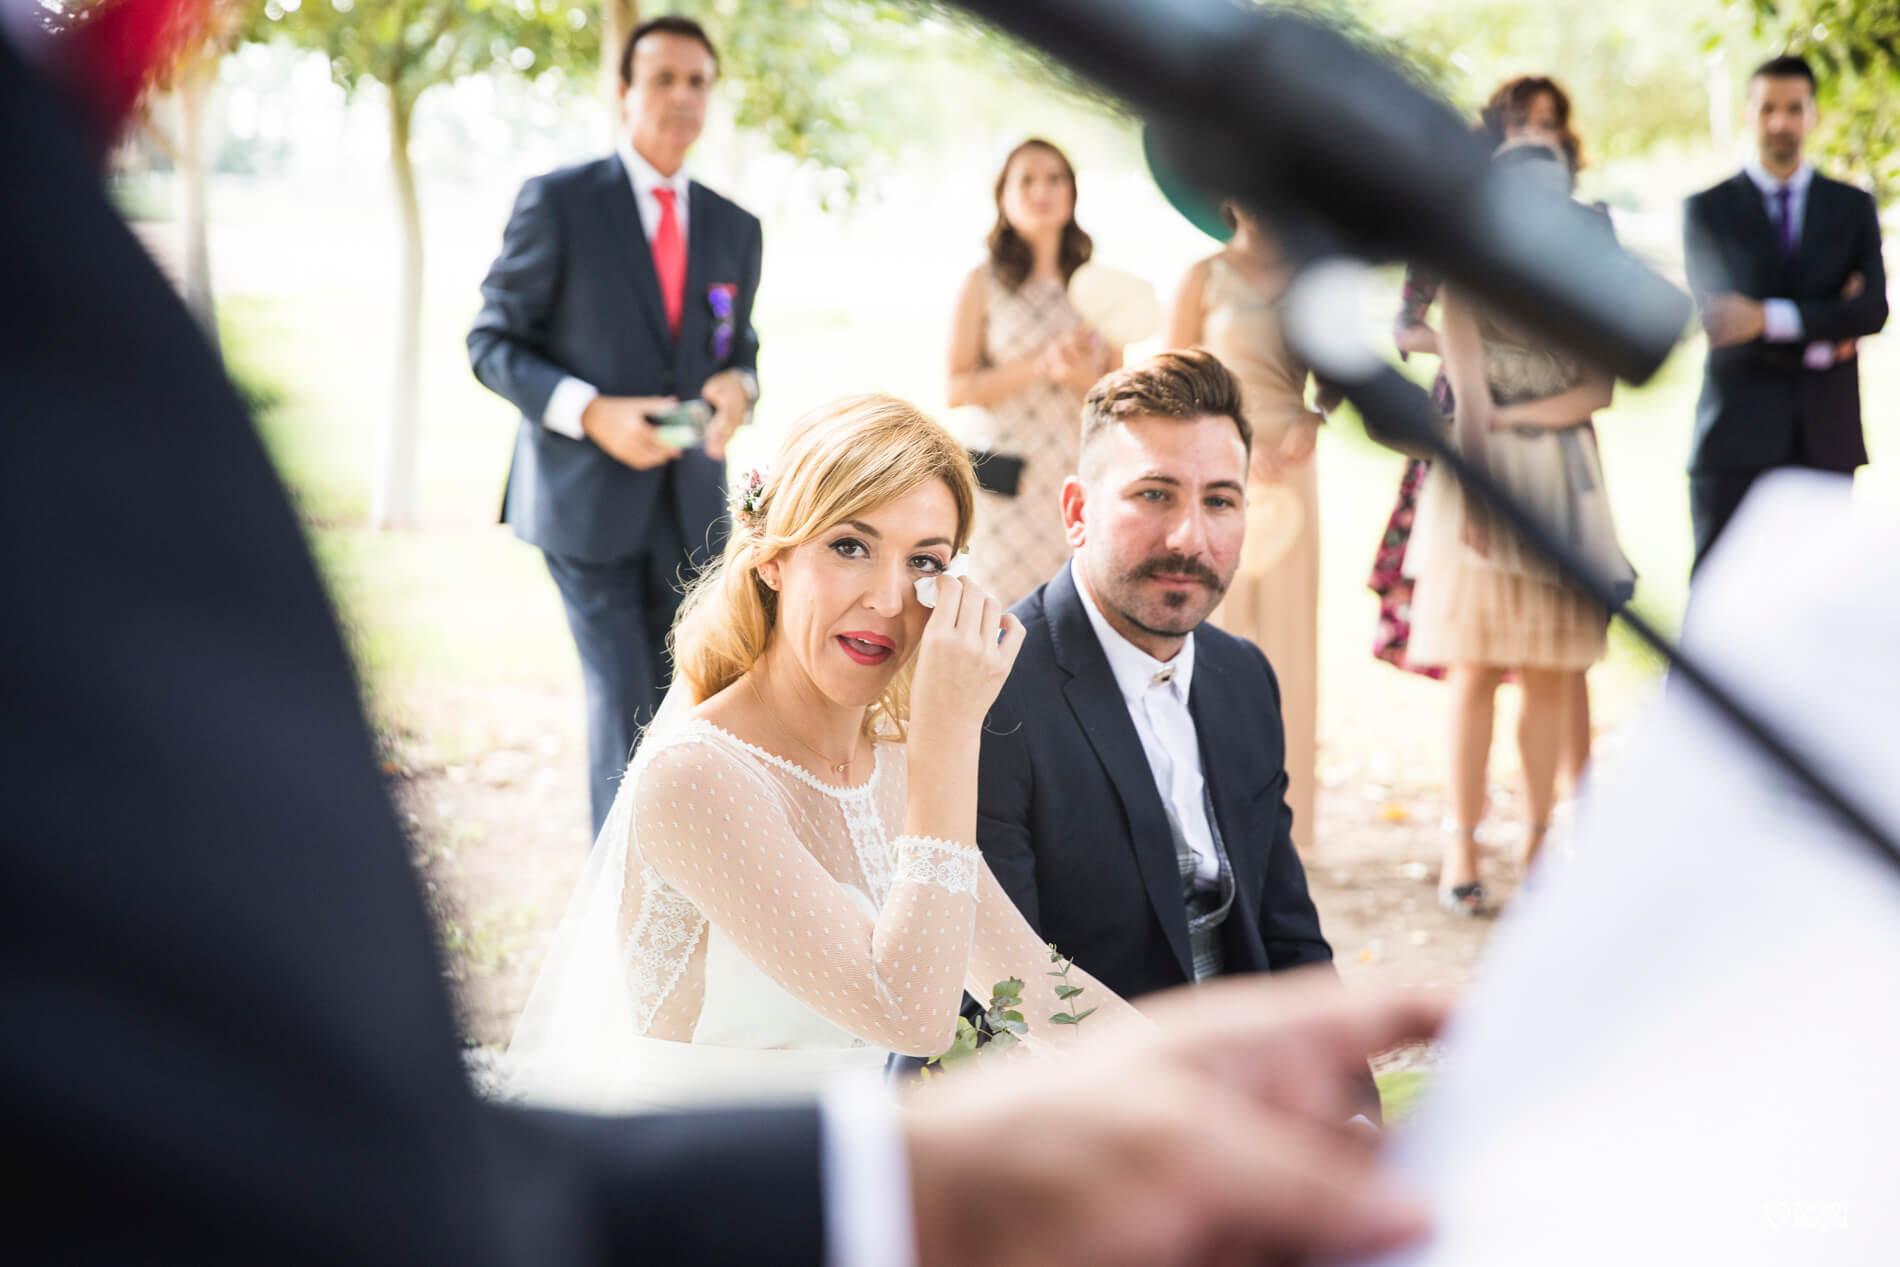 la-boda-de-alemc7-miriam-alegria-fotografos-boda-murcia-46